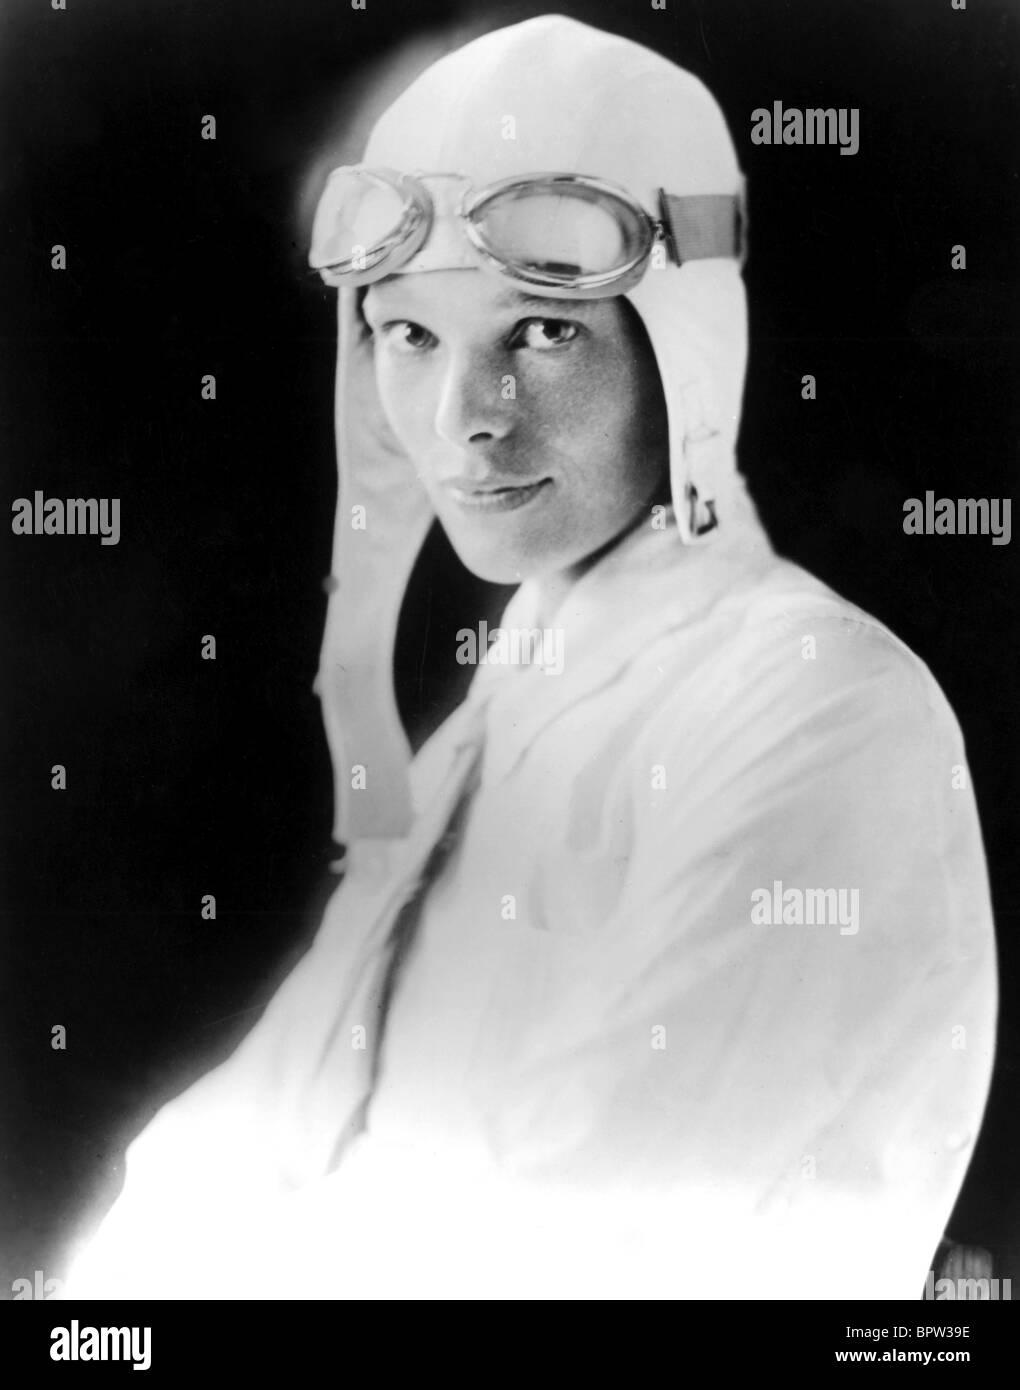 AMELIA EARHART PILOT 01 Maggio 1930 Immagini Stock